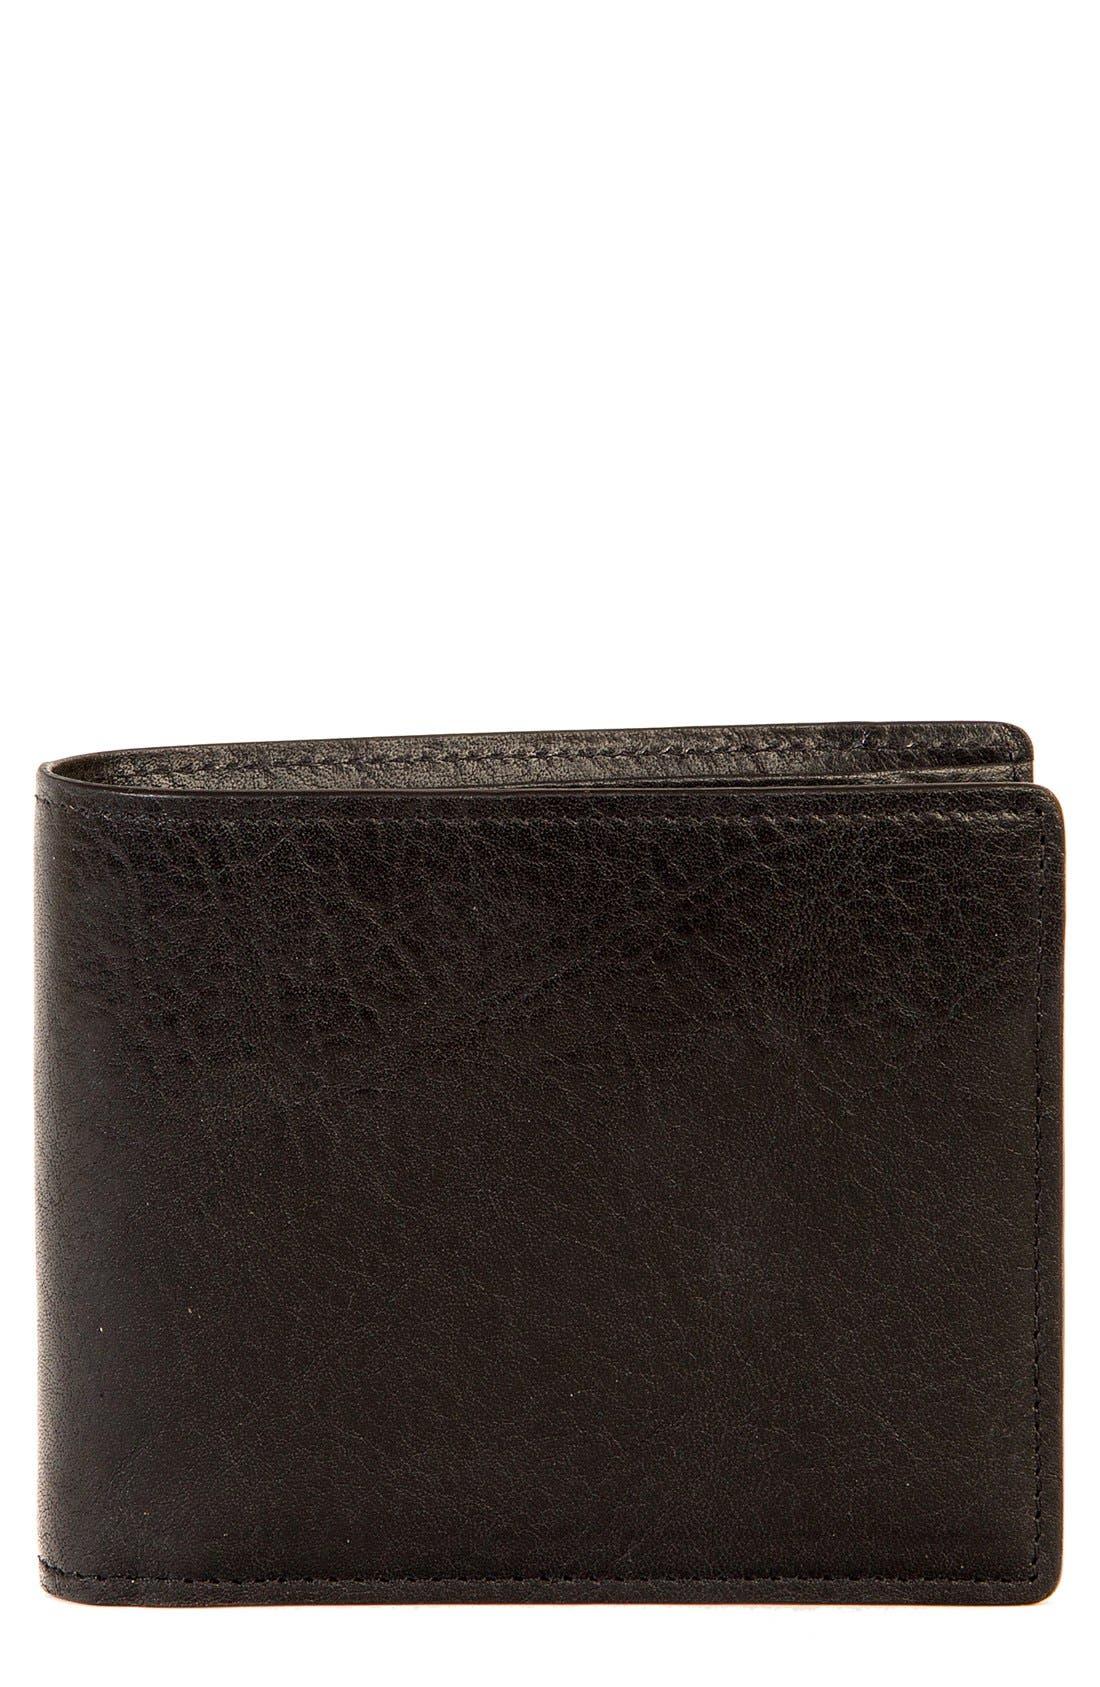 BOCONI,                             'Becker' RFID Leather Wallet,                             Main thumbnail 1, color,                             BLACK